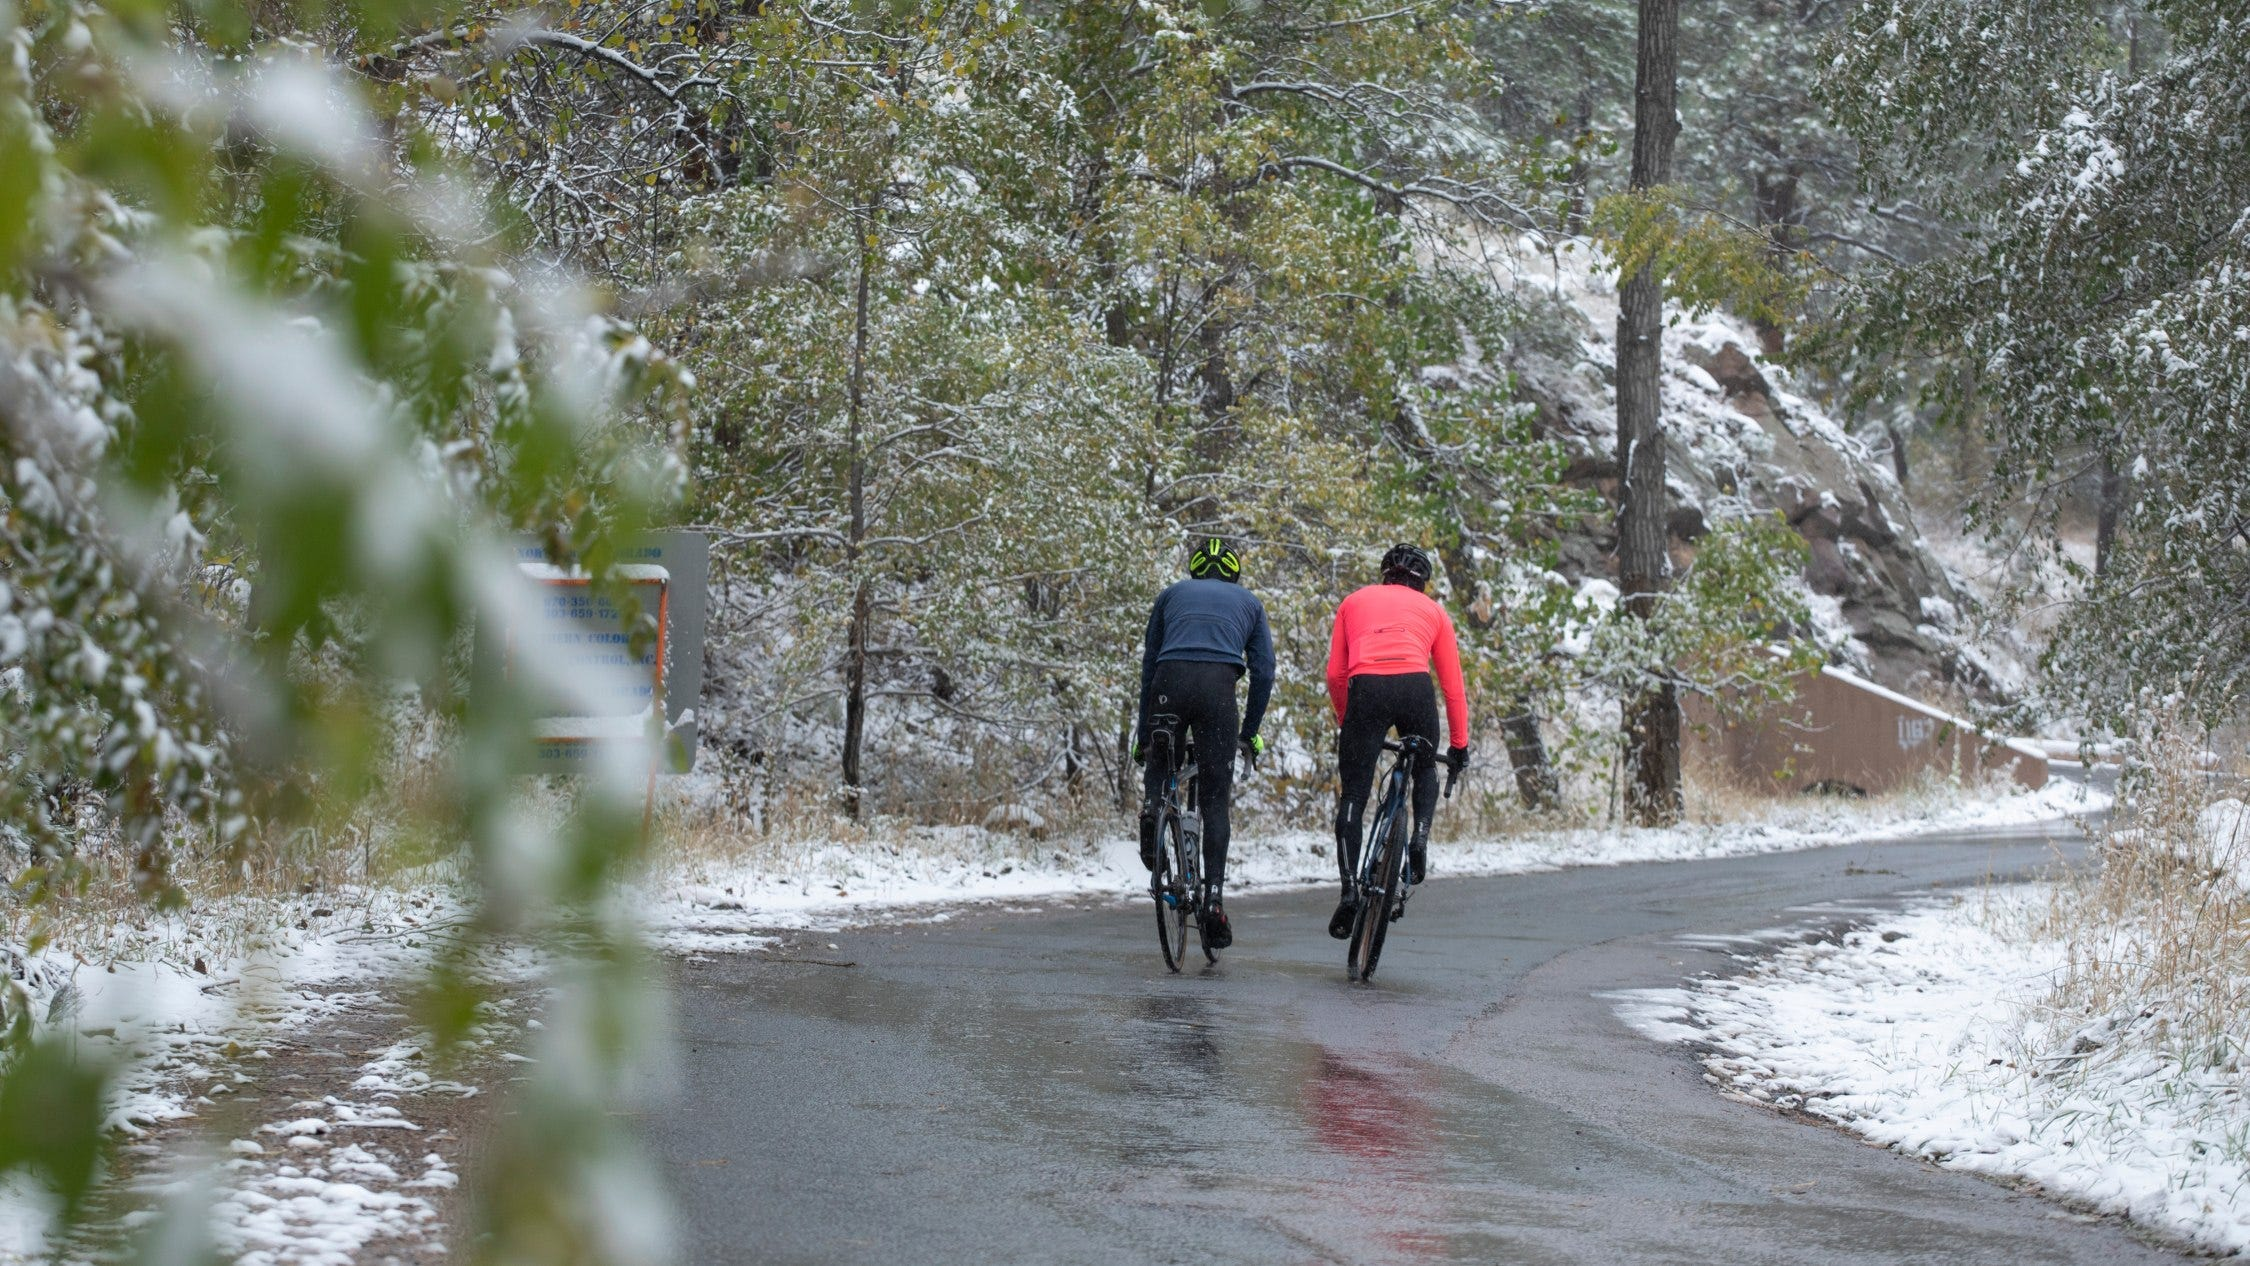 Winter Highlights from PEARL iZUMi